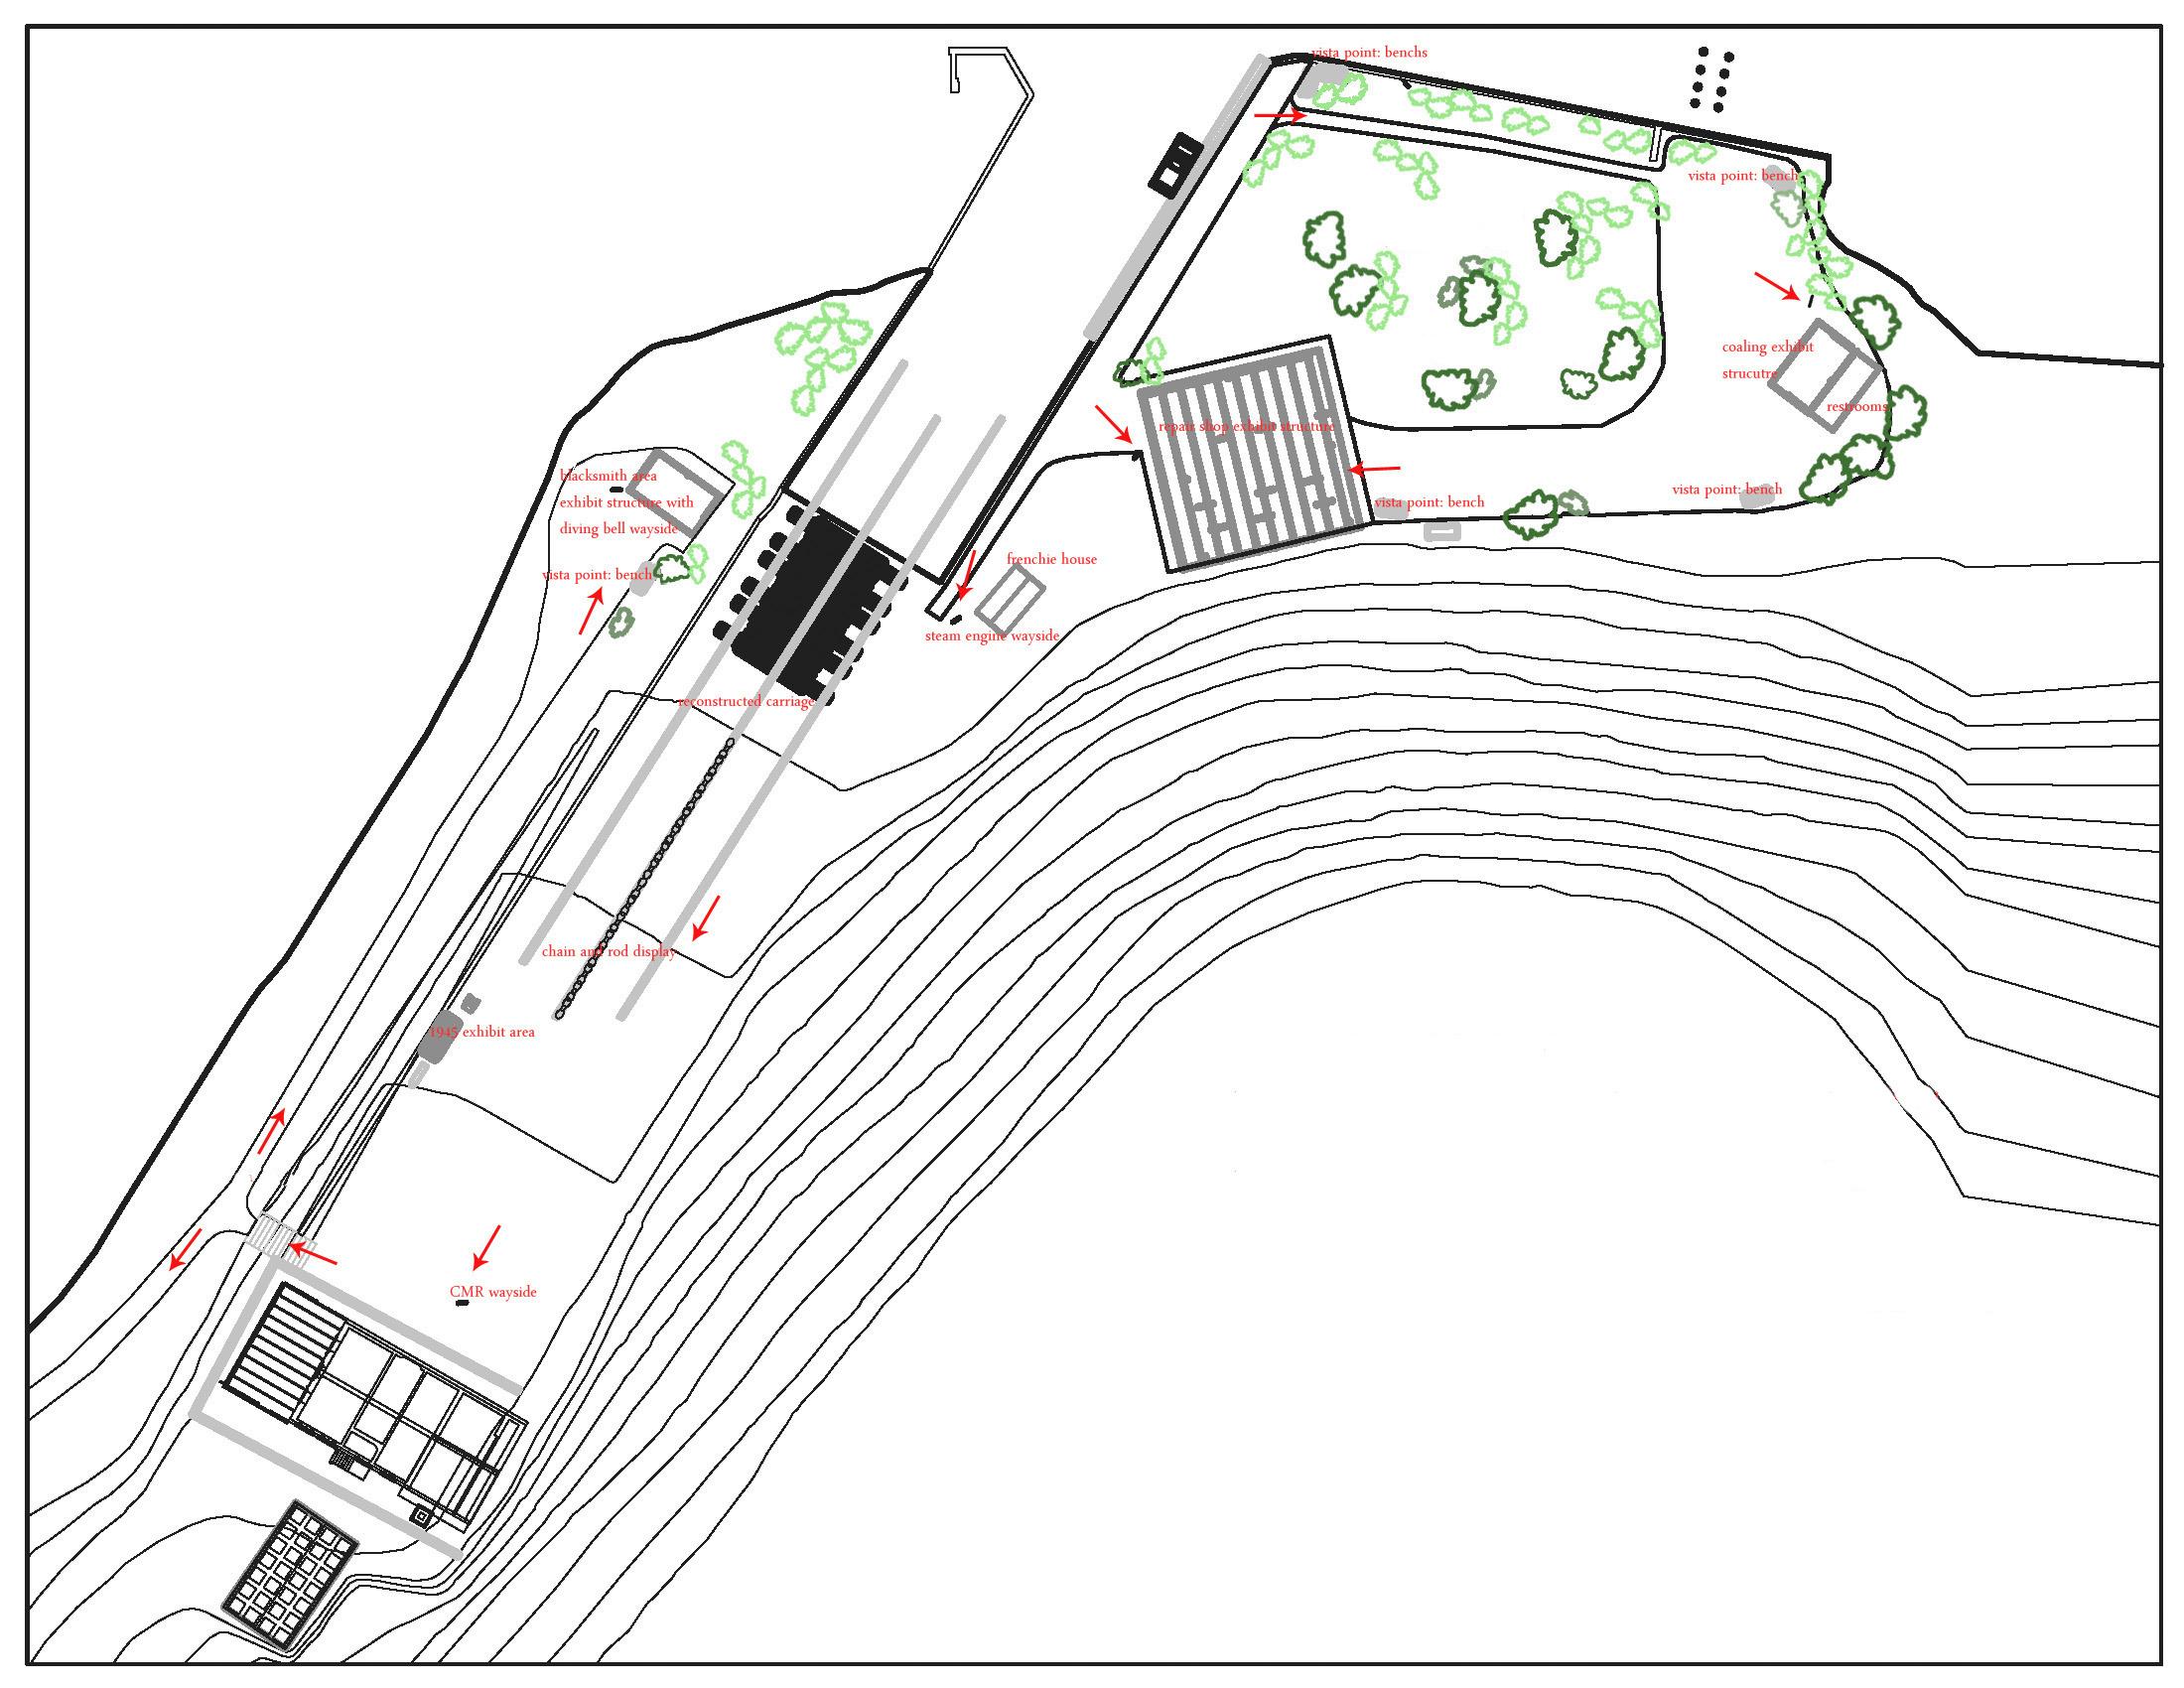 Proposed plan for Creque Marine Railway interpretation